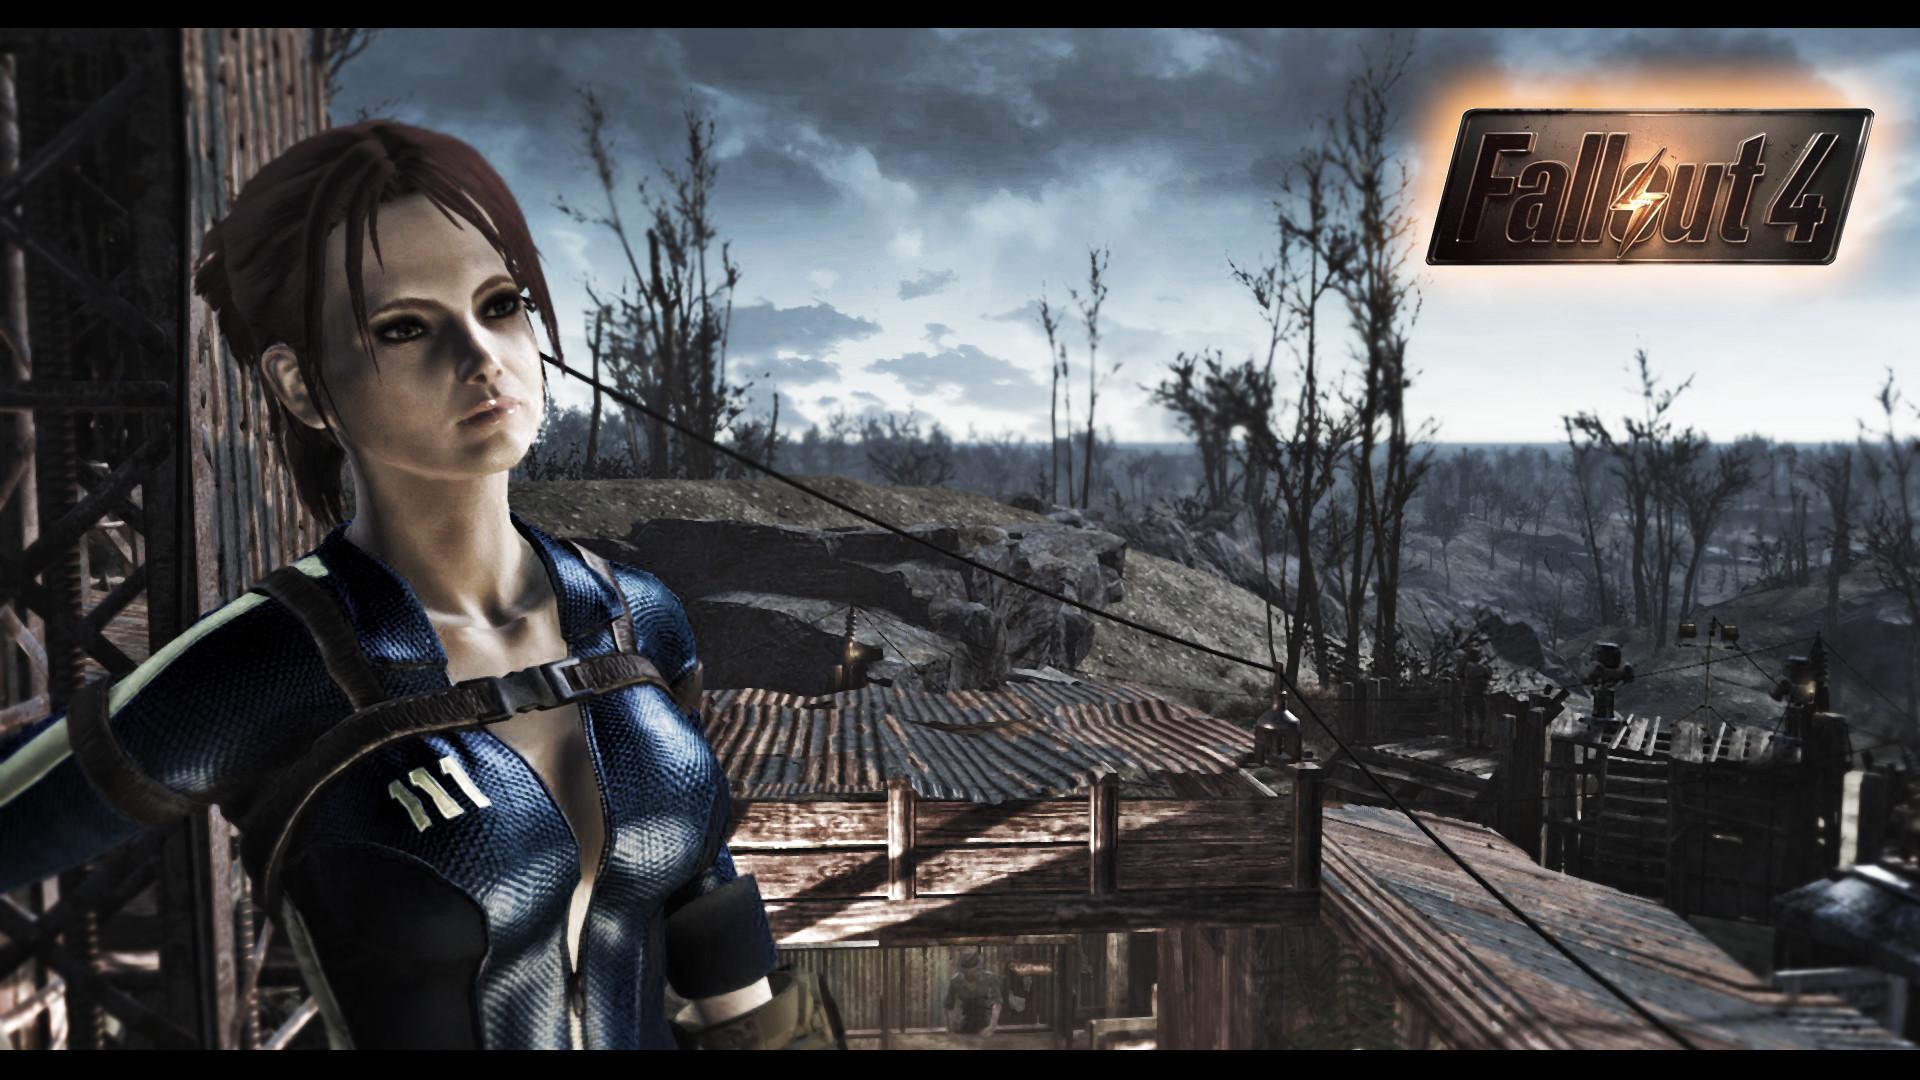 Fallout 4 Vault Girl by DonMichael71 Fallout 4 Vault Girl by DonMichael71